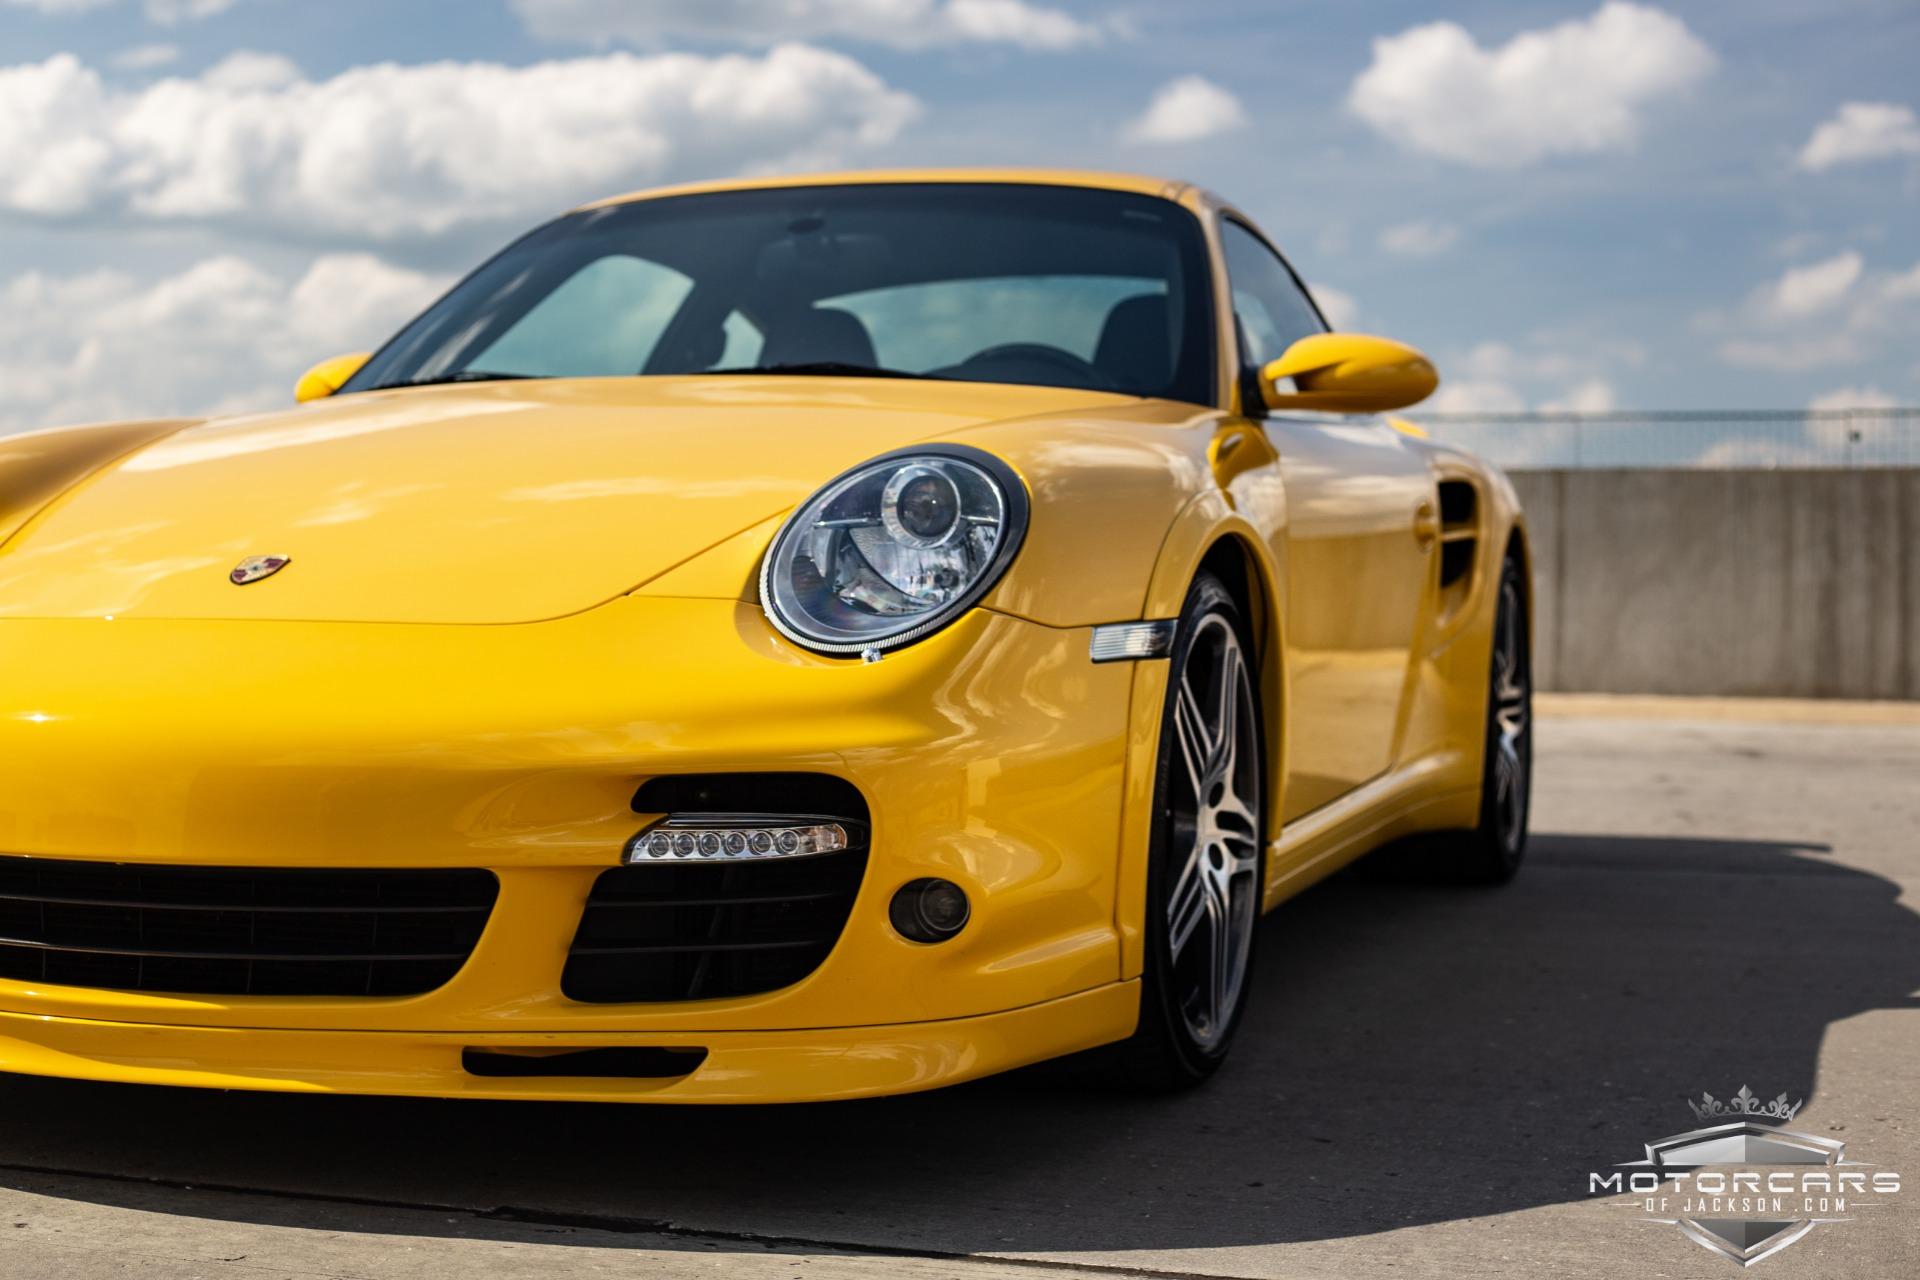 Used-2008-Porsche-911-Turbo-Jackson-MS